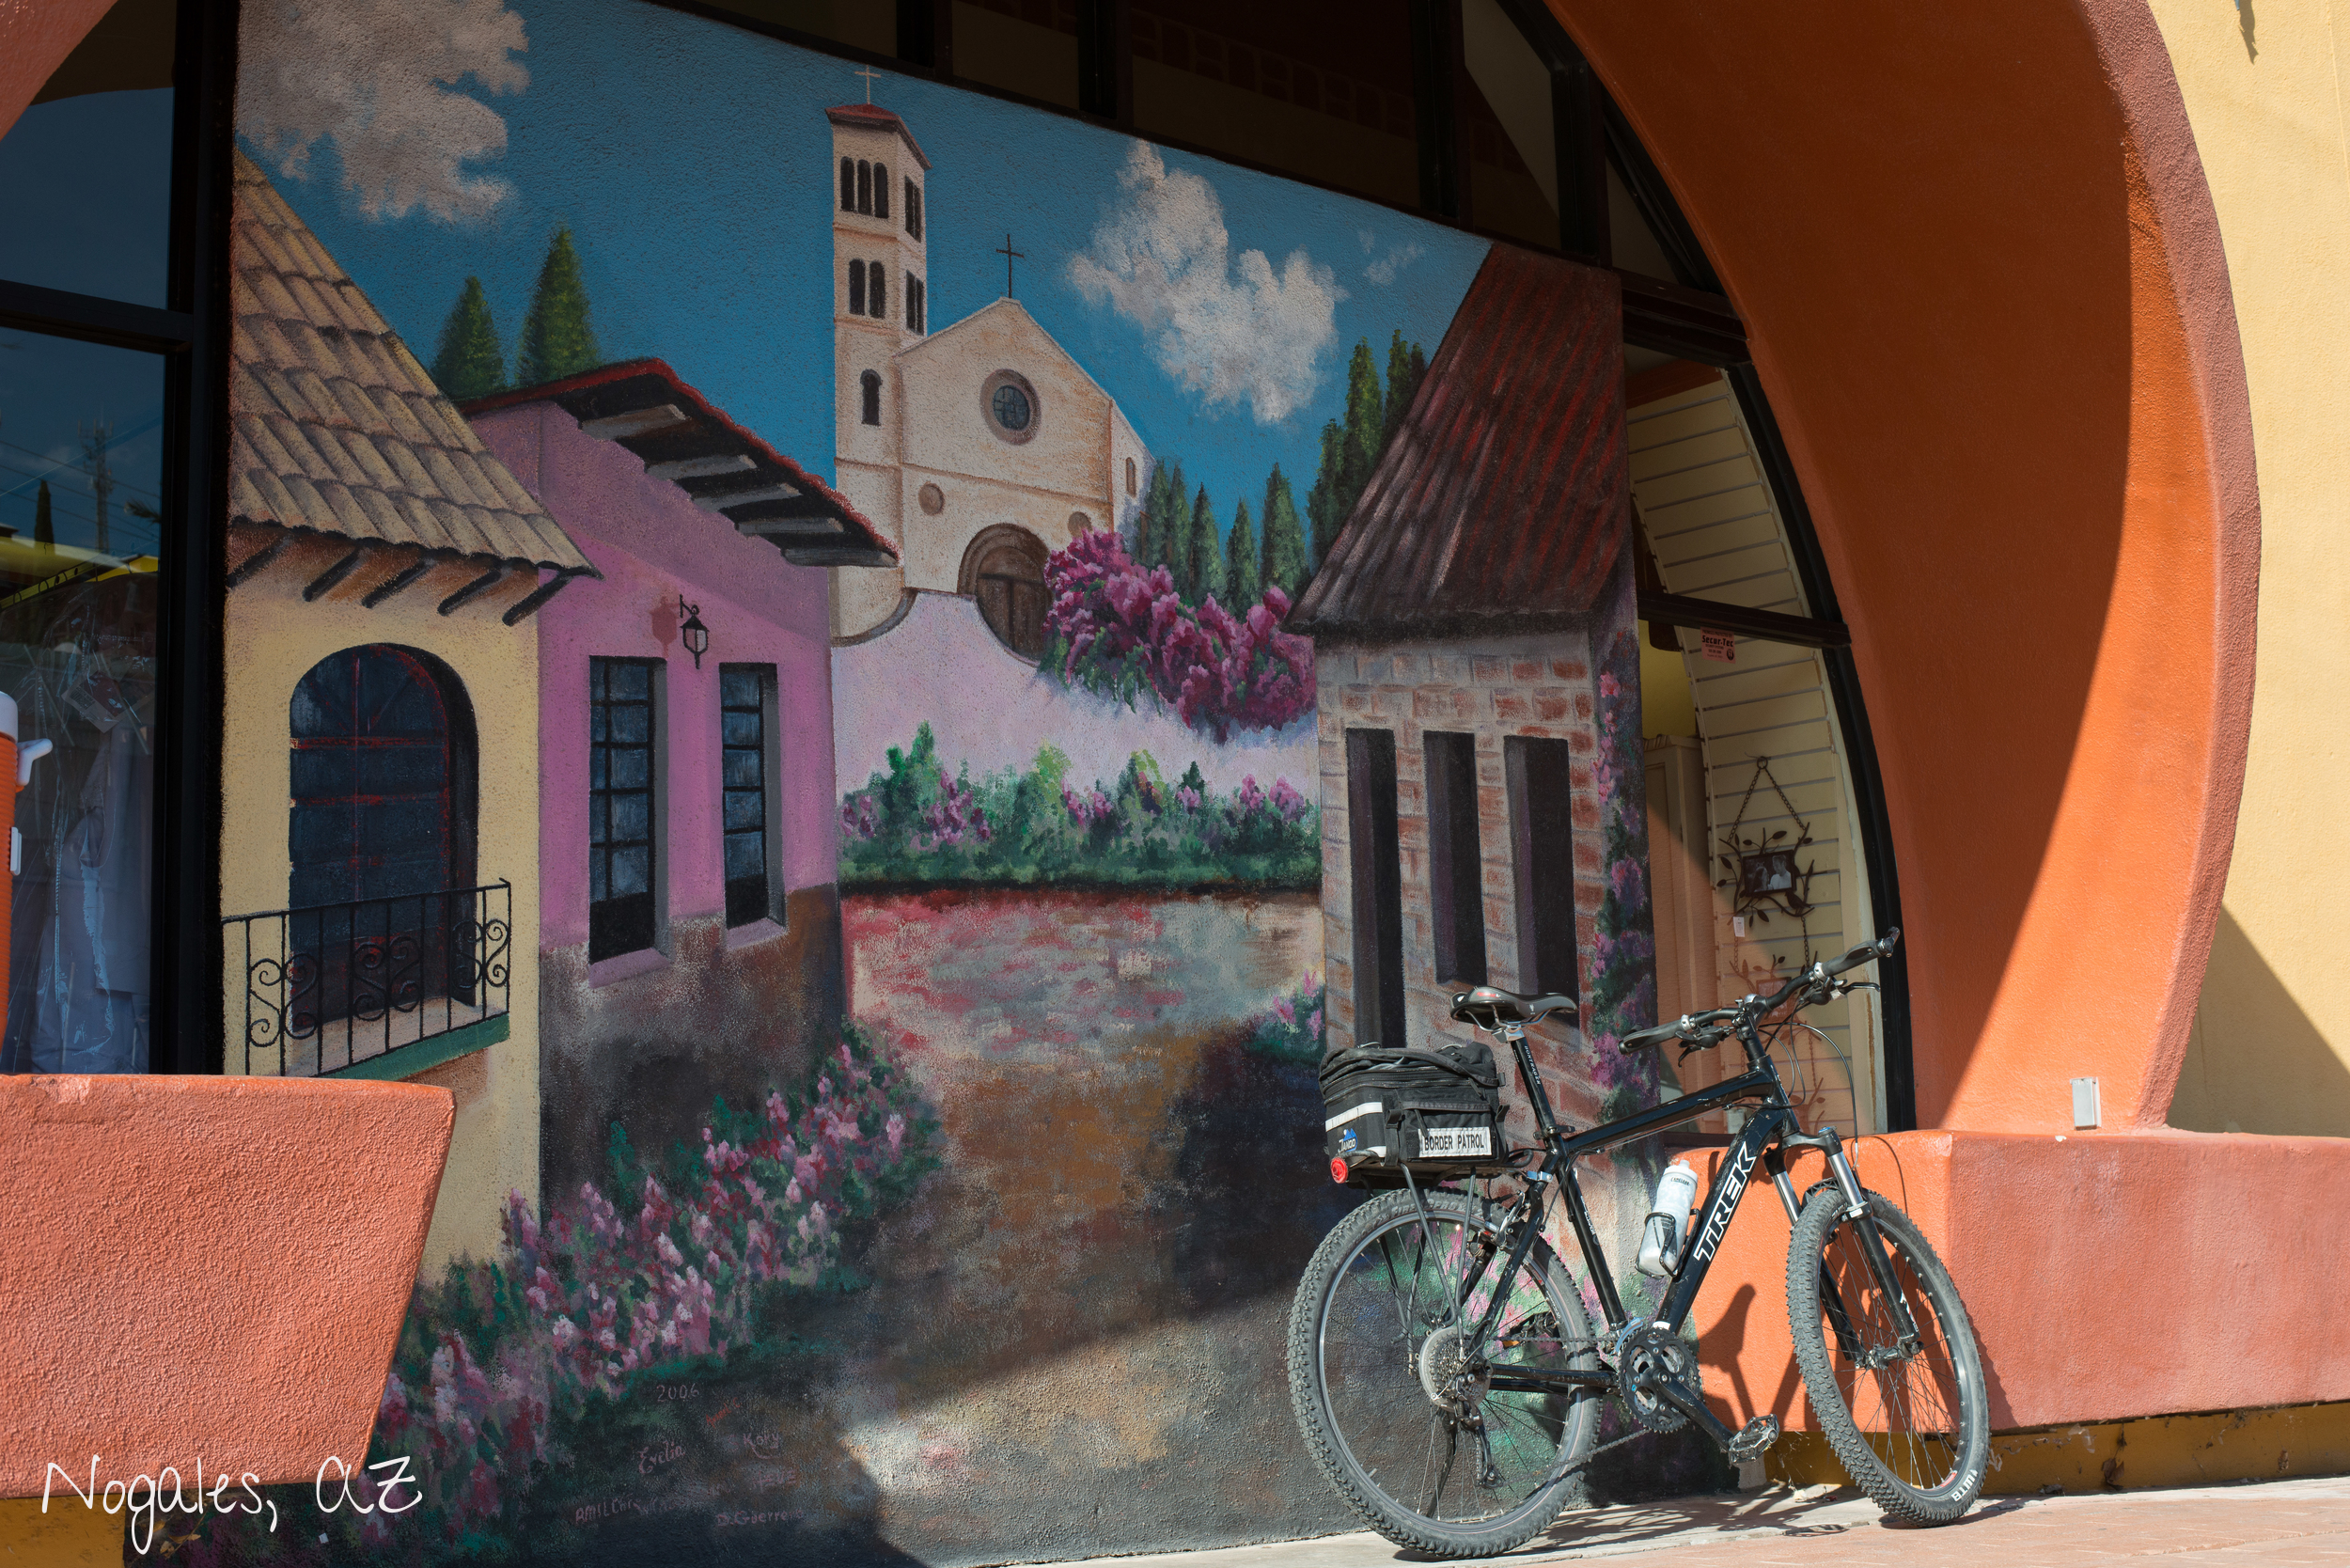 Border mural